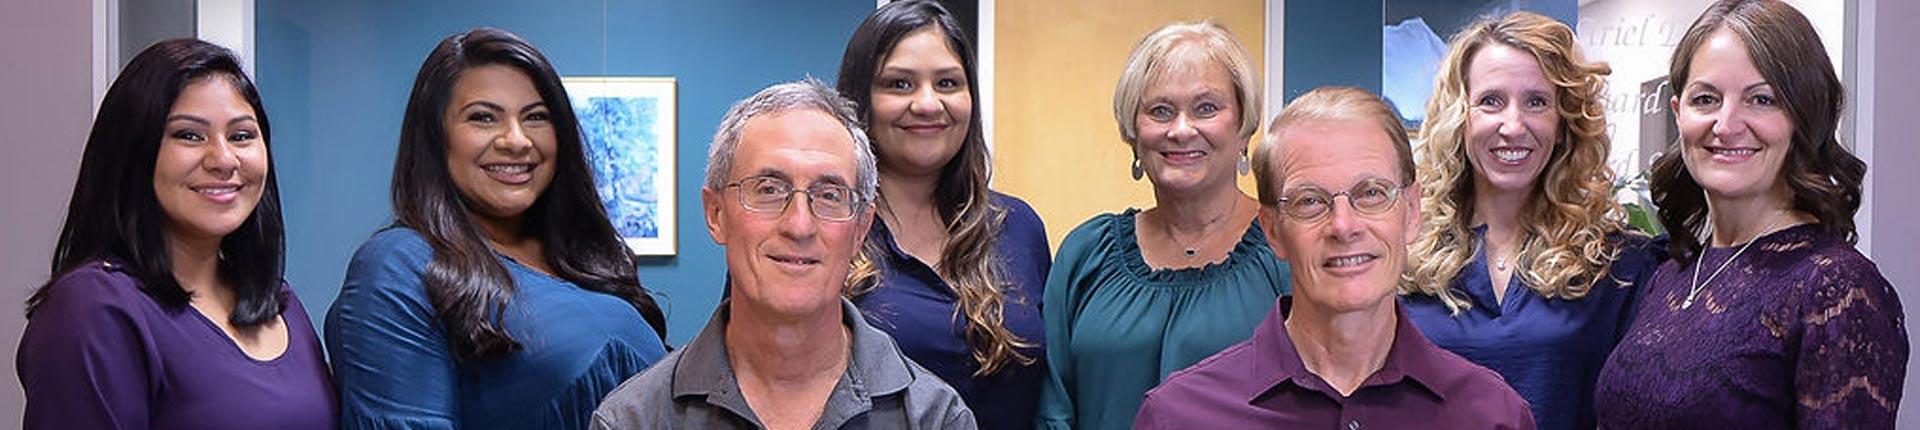 Endodontic Consultants of San Antonio Team